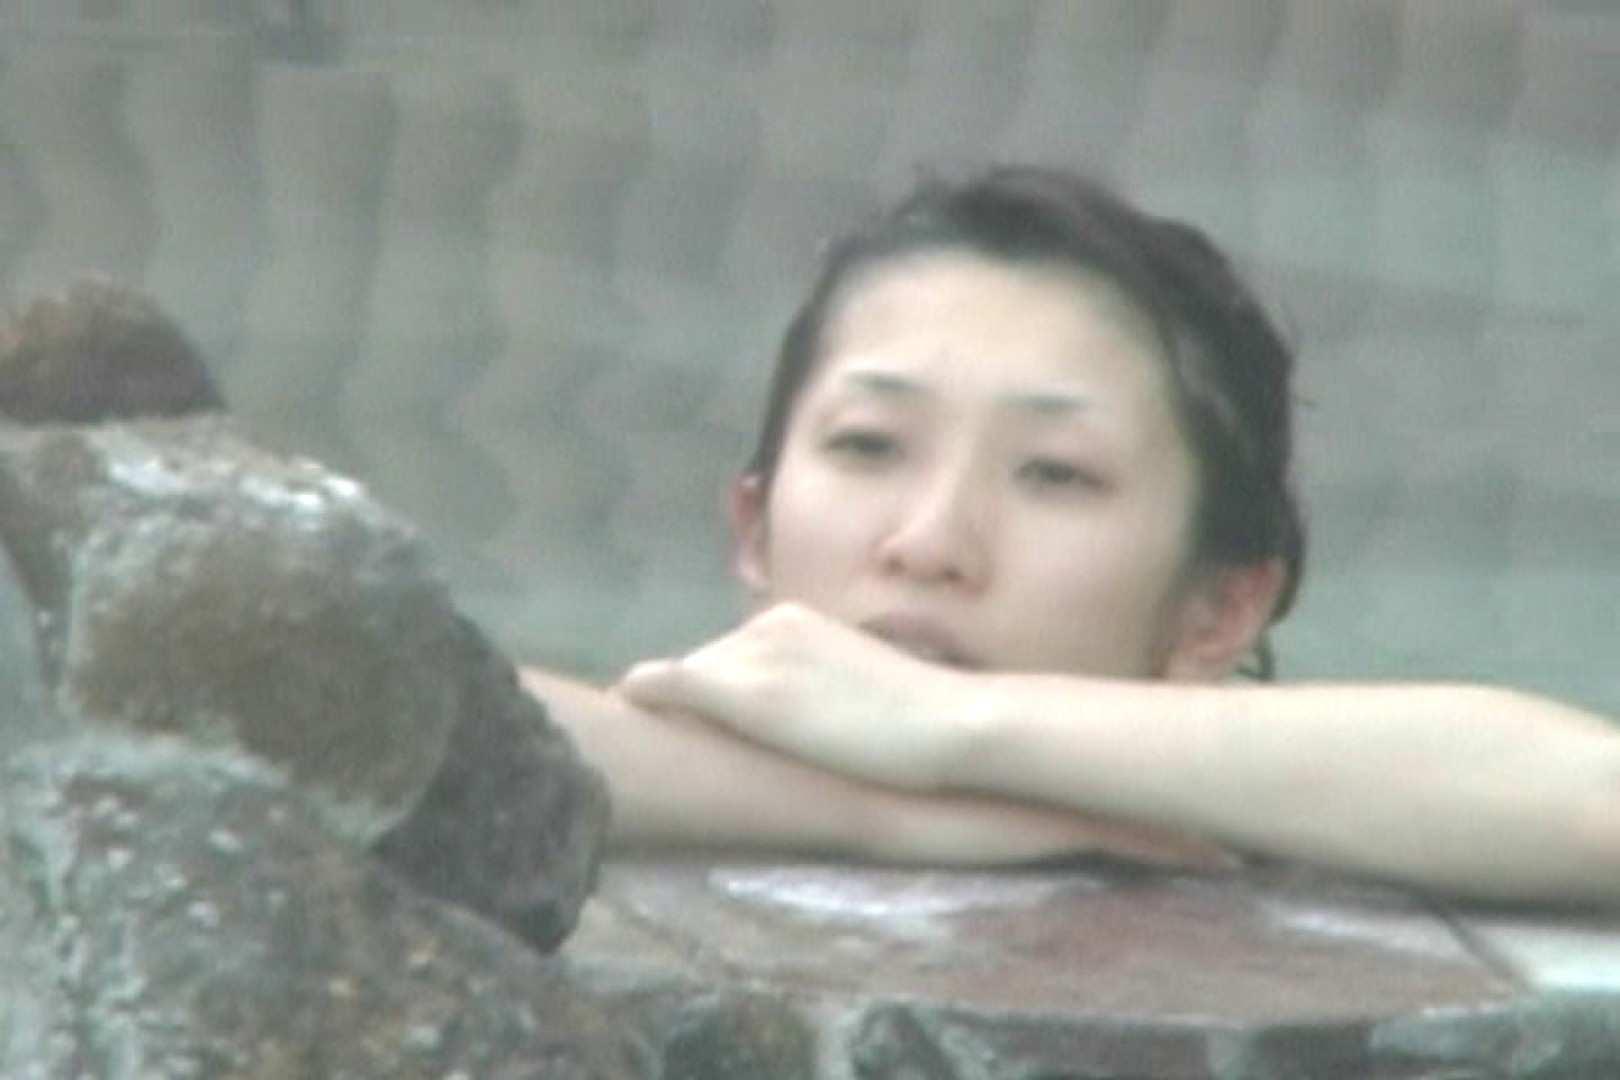 Aquaな露天風呂Vol.588 HなOL | 盗撮  66pic 20